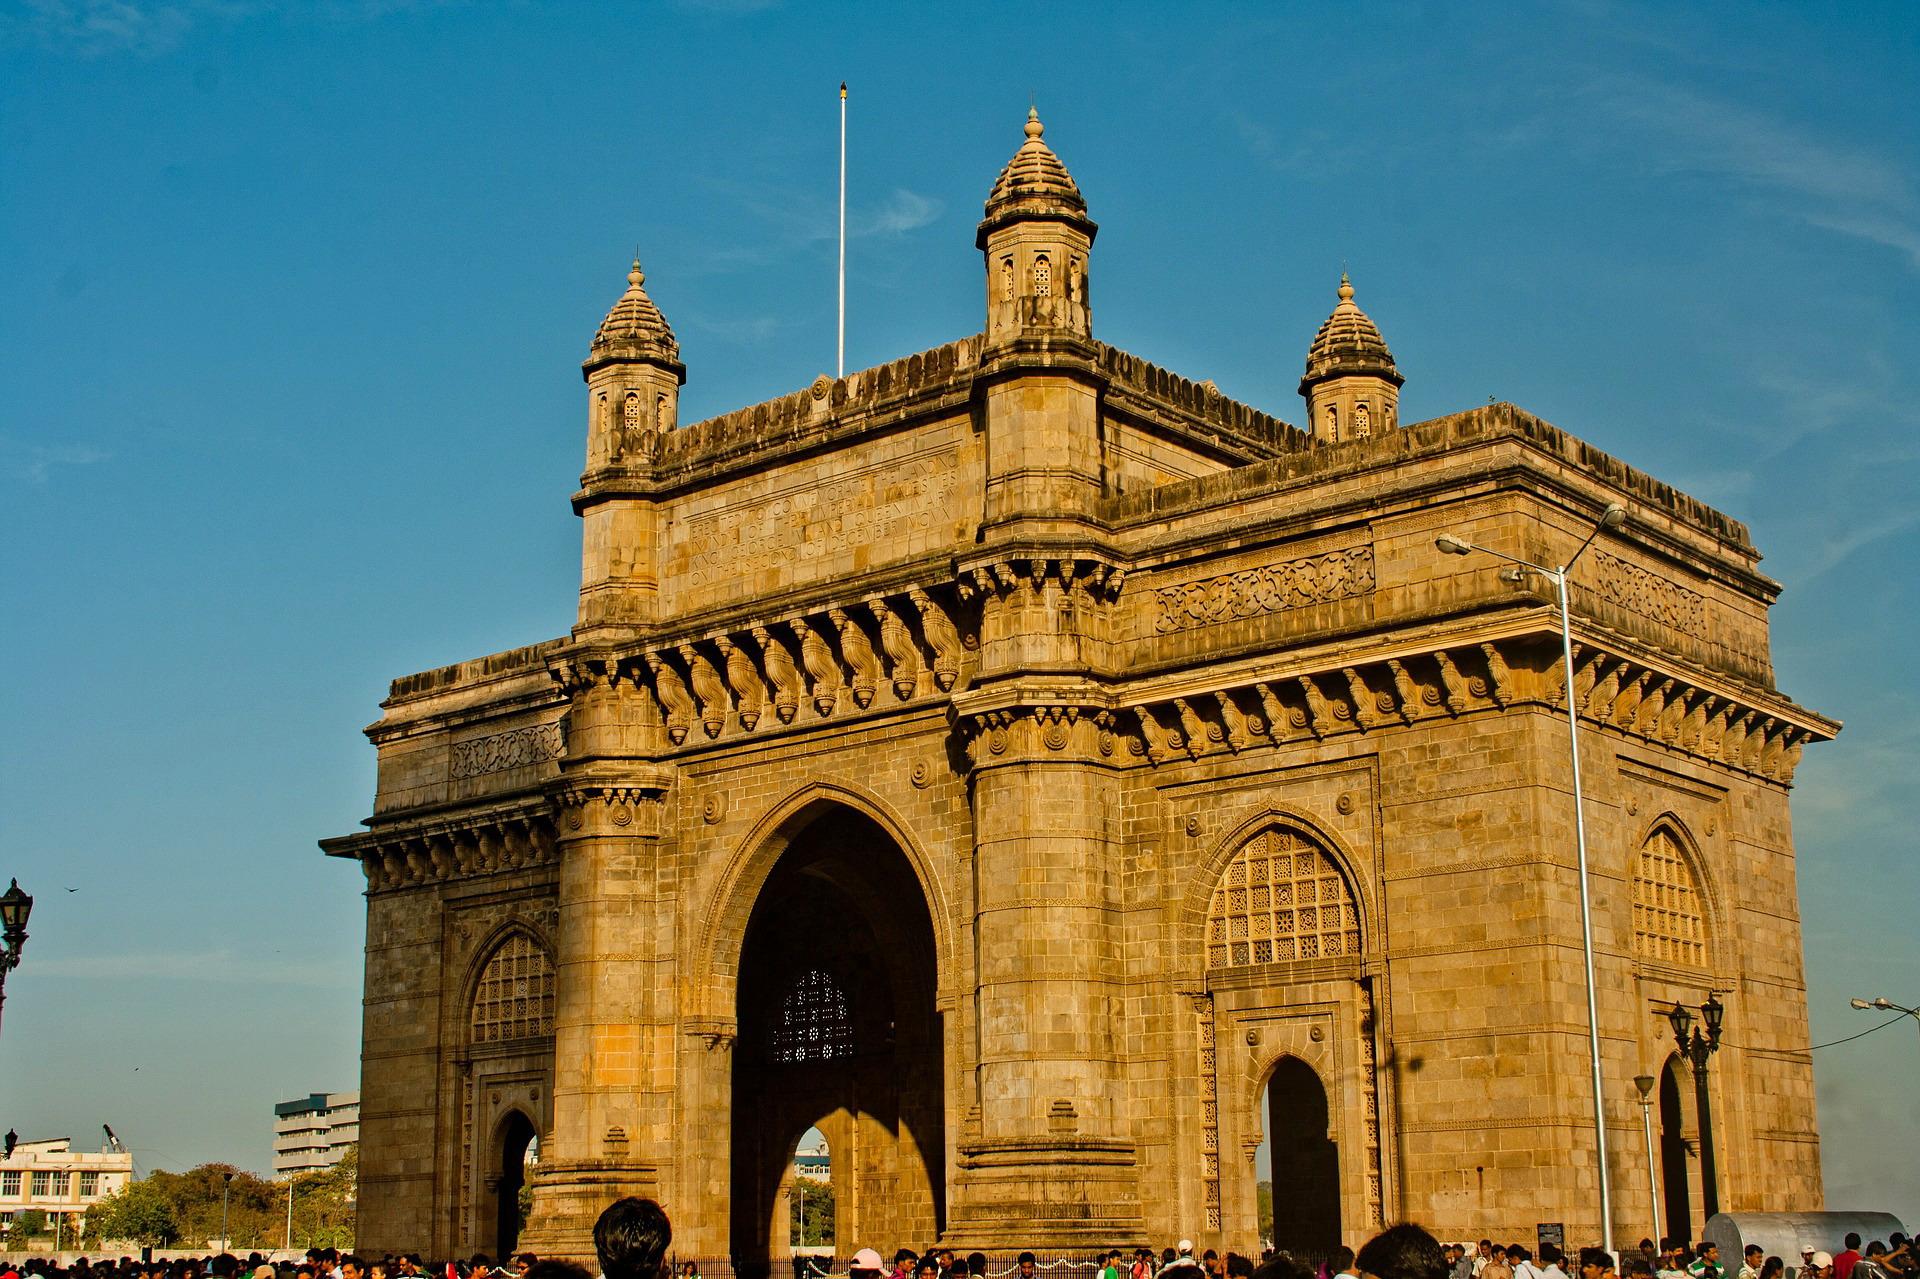 gateway-of-india-390800_1920-2.jpg